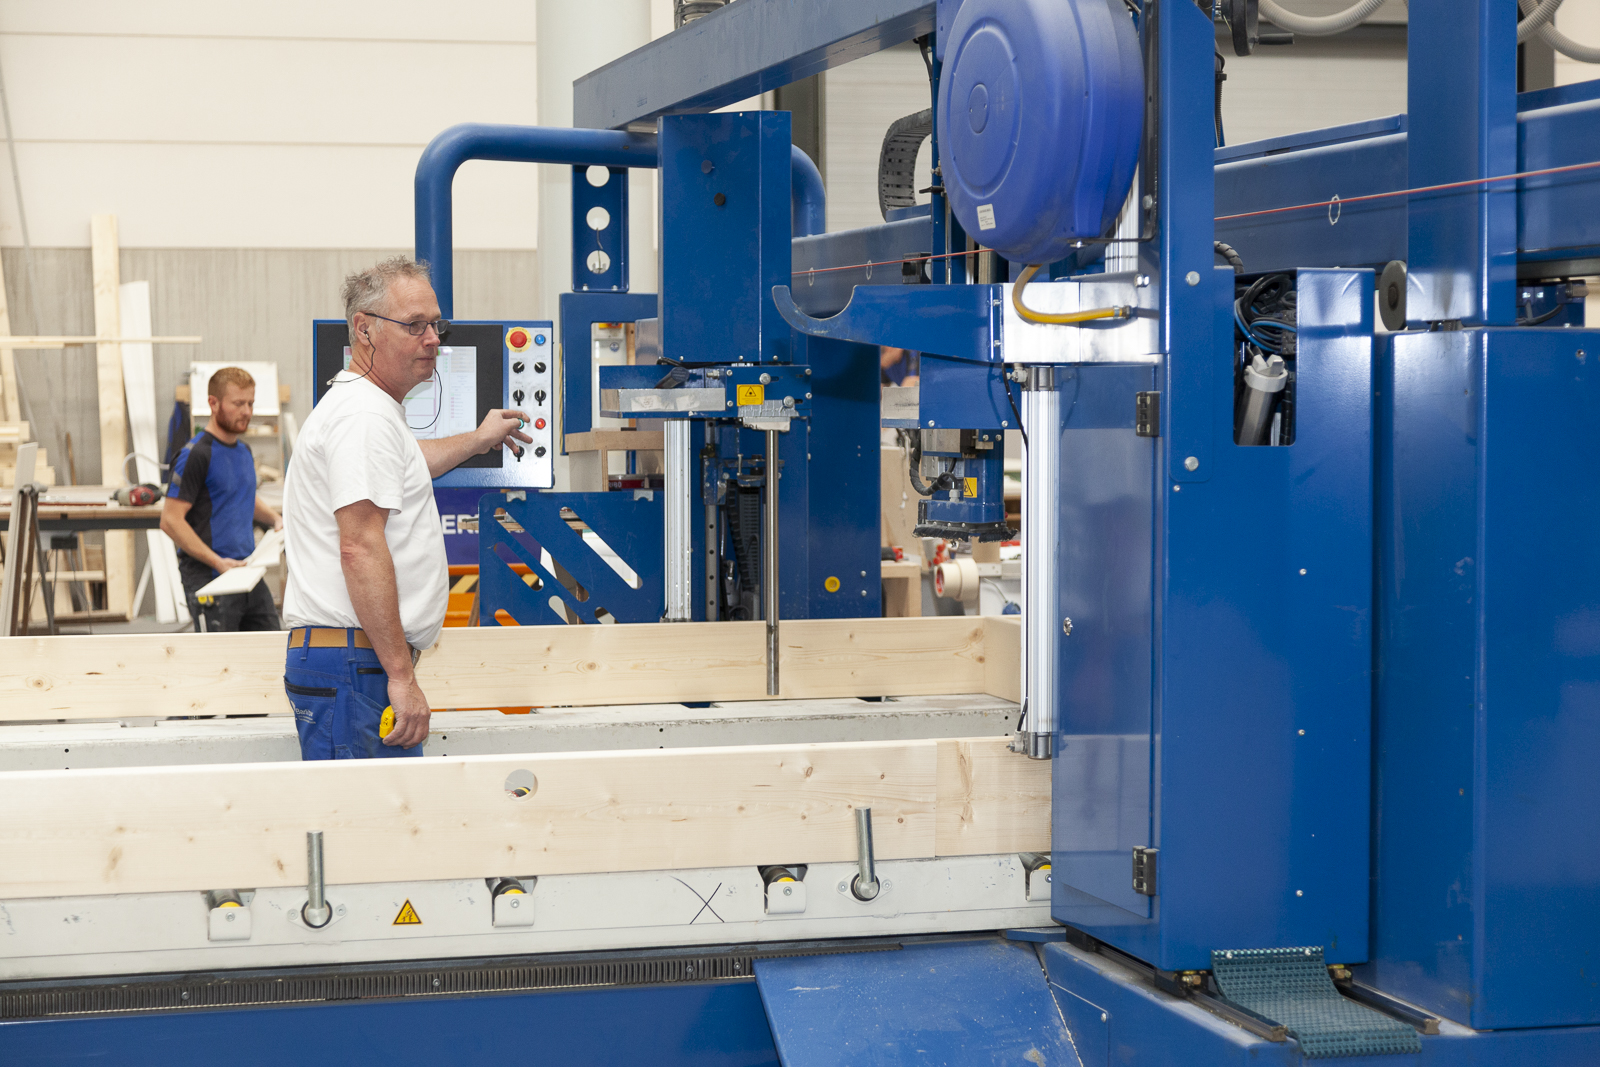 VACATURE: Machinaal houtbewerker/ CNC operator